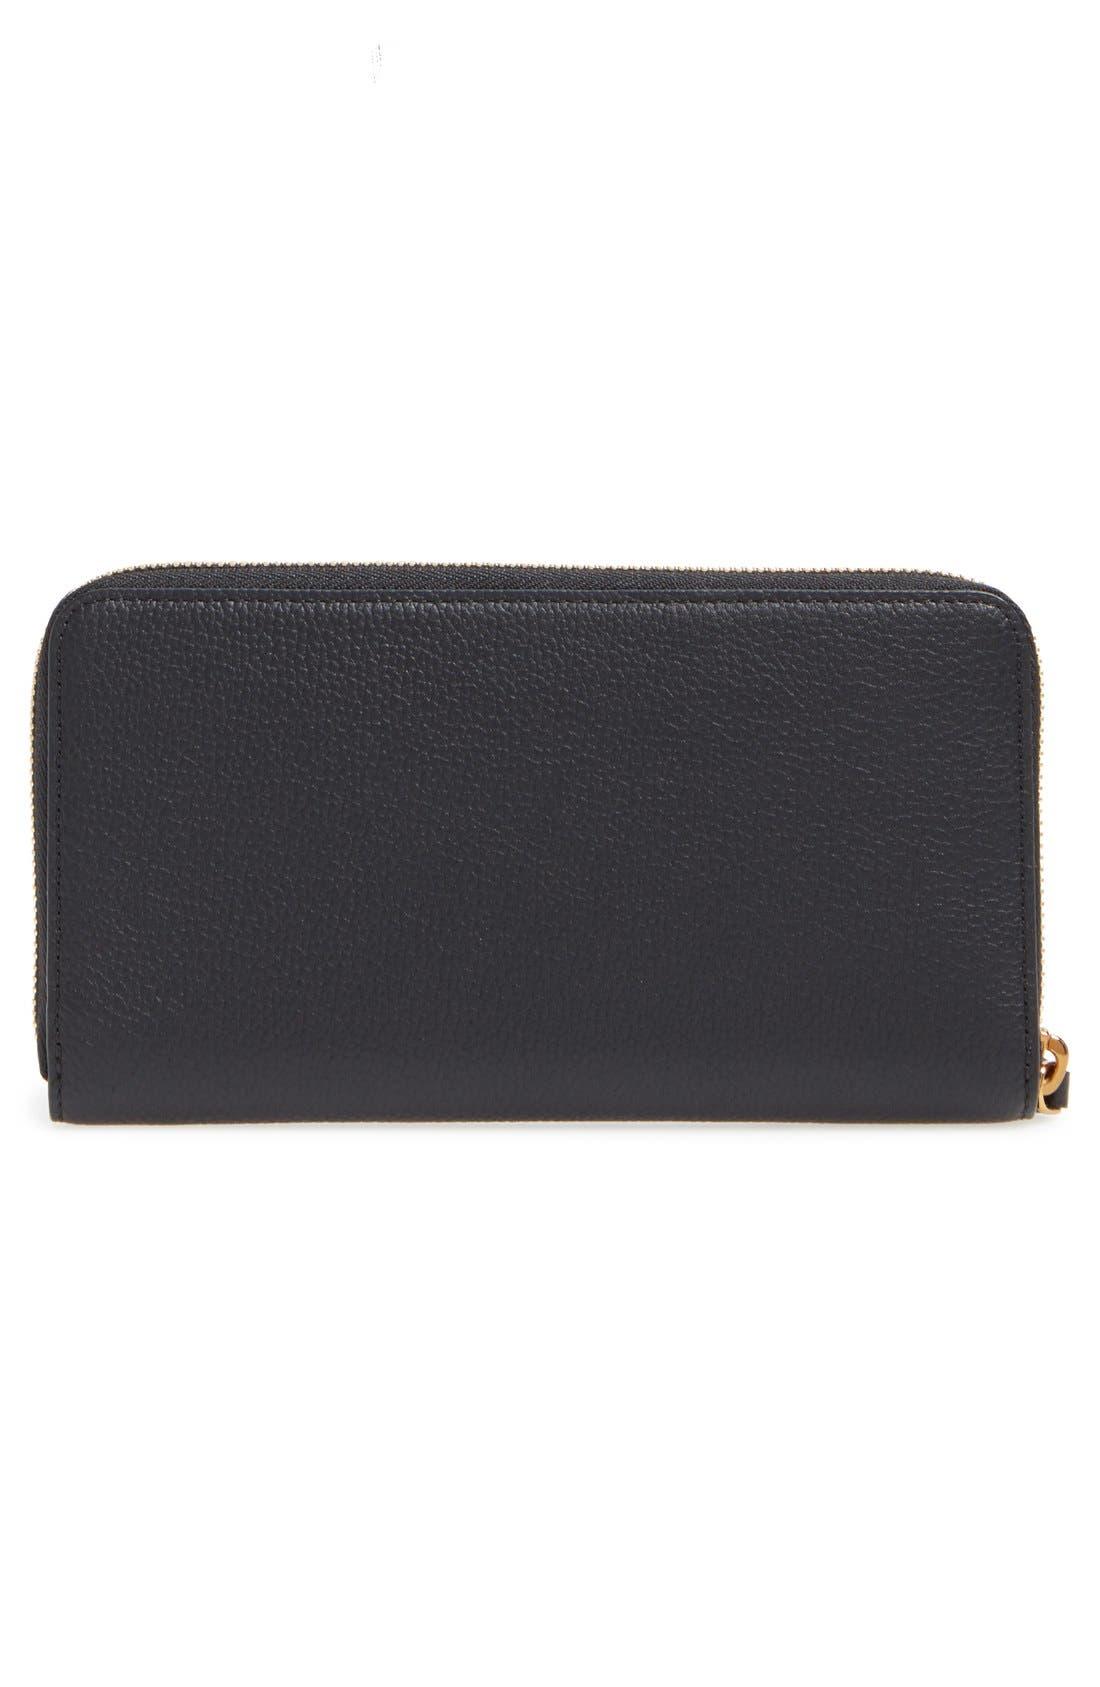 Milla Leather Zip Around Wallet,                             Alternate thumbnail 6, color,                             001